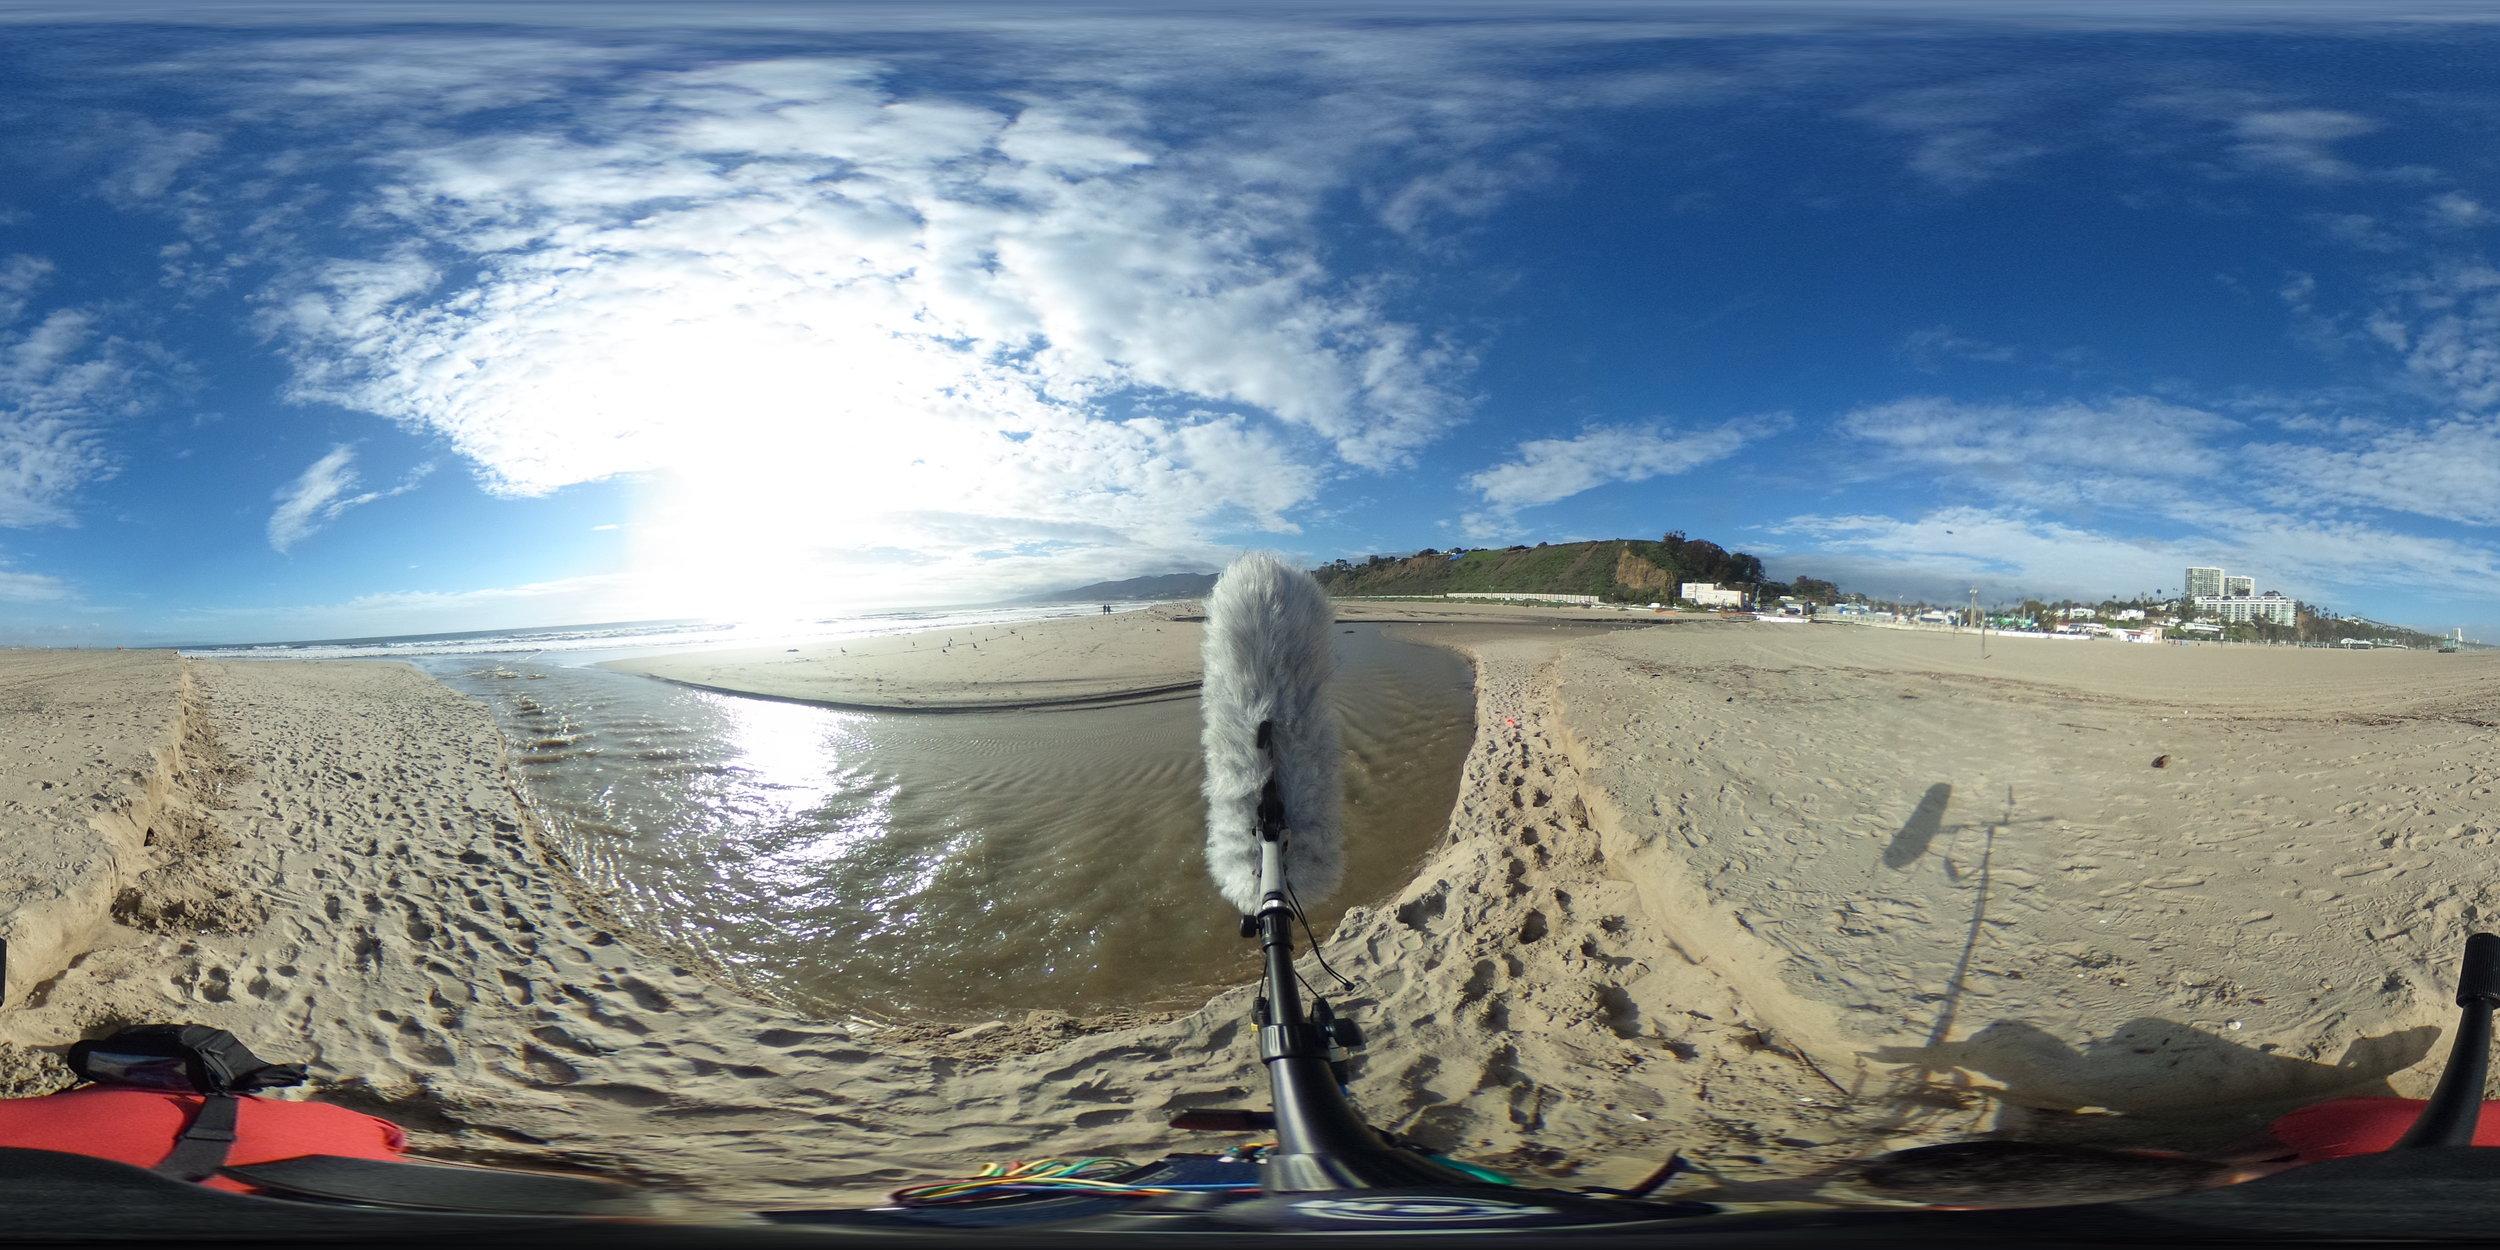 EXT_Day_Beach_OceanWaves_MediumDistance_EstuaryCurrent_GentleWaterLapping_JPEG.JPG